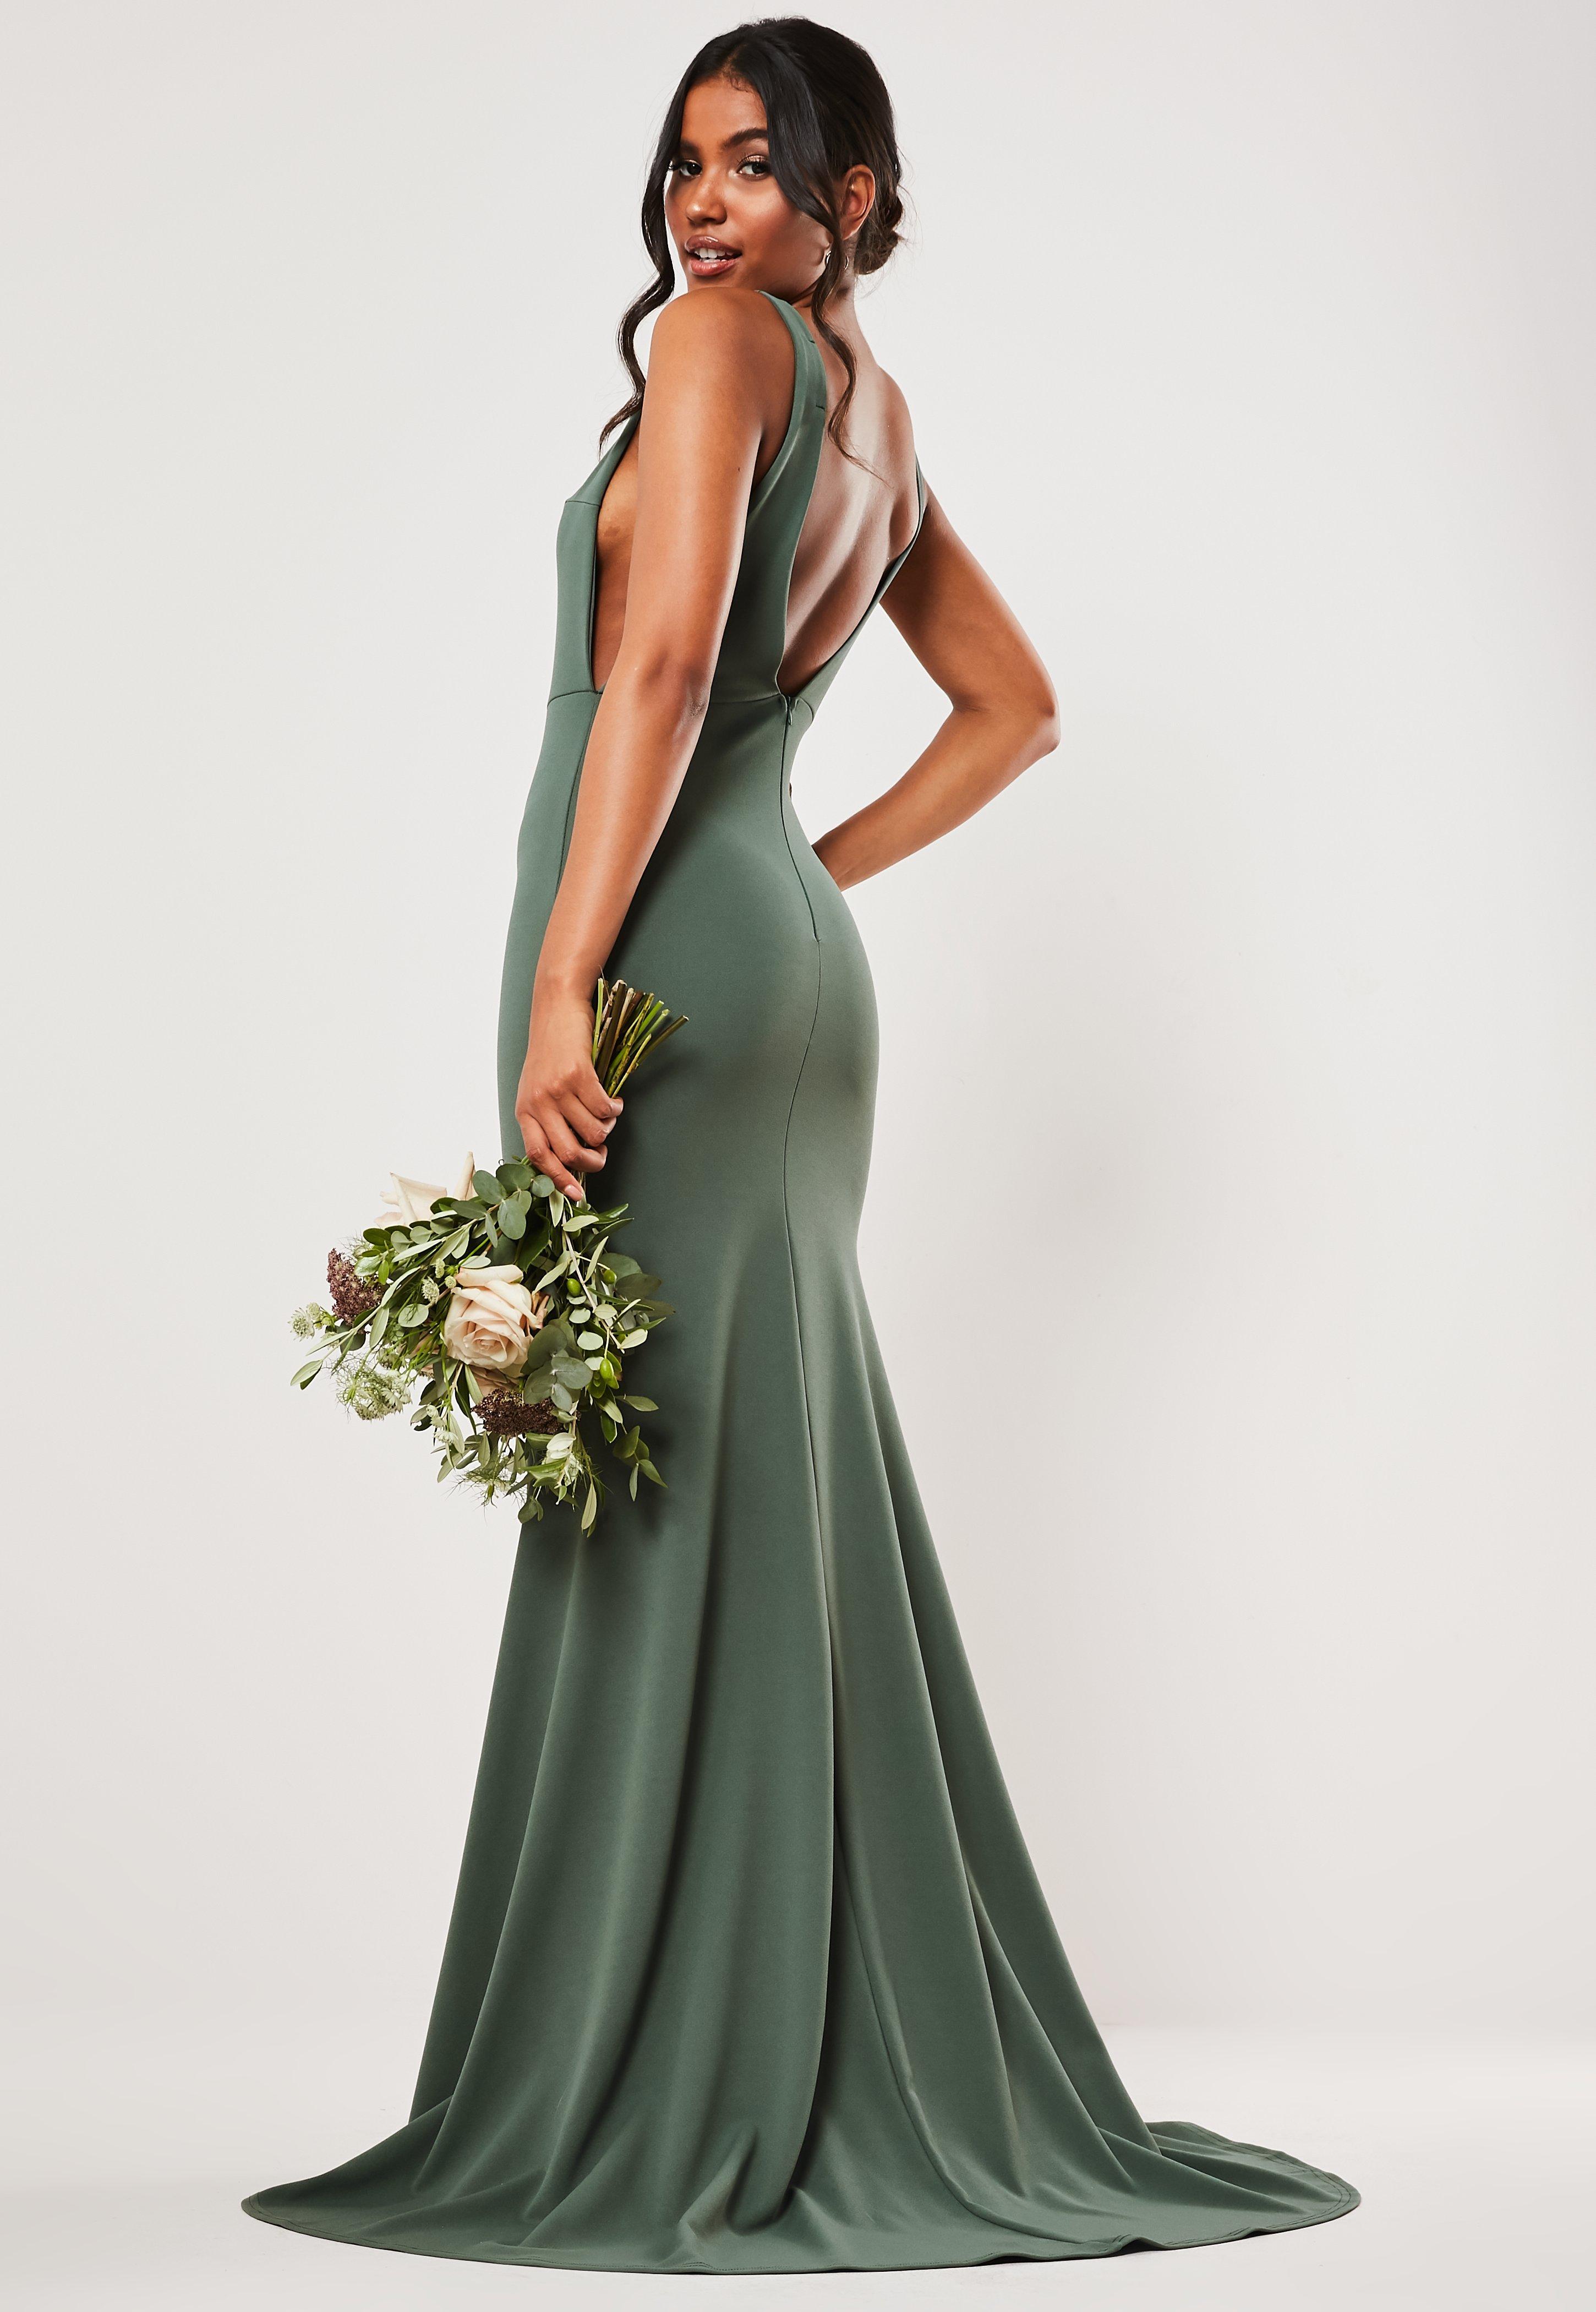 62e24d40f0 Bridesmaid Green Sleeveless Low Back Maxi Dress